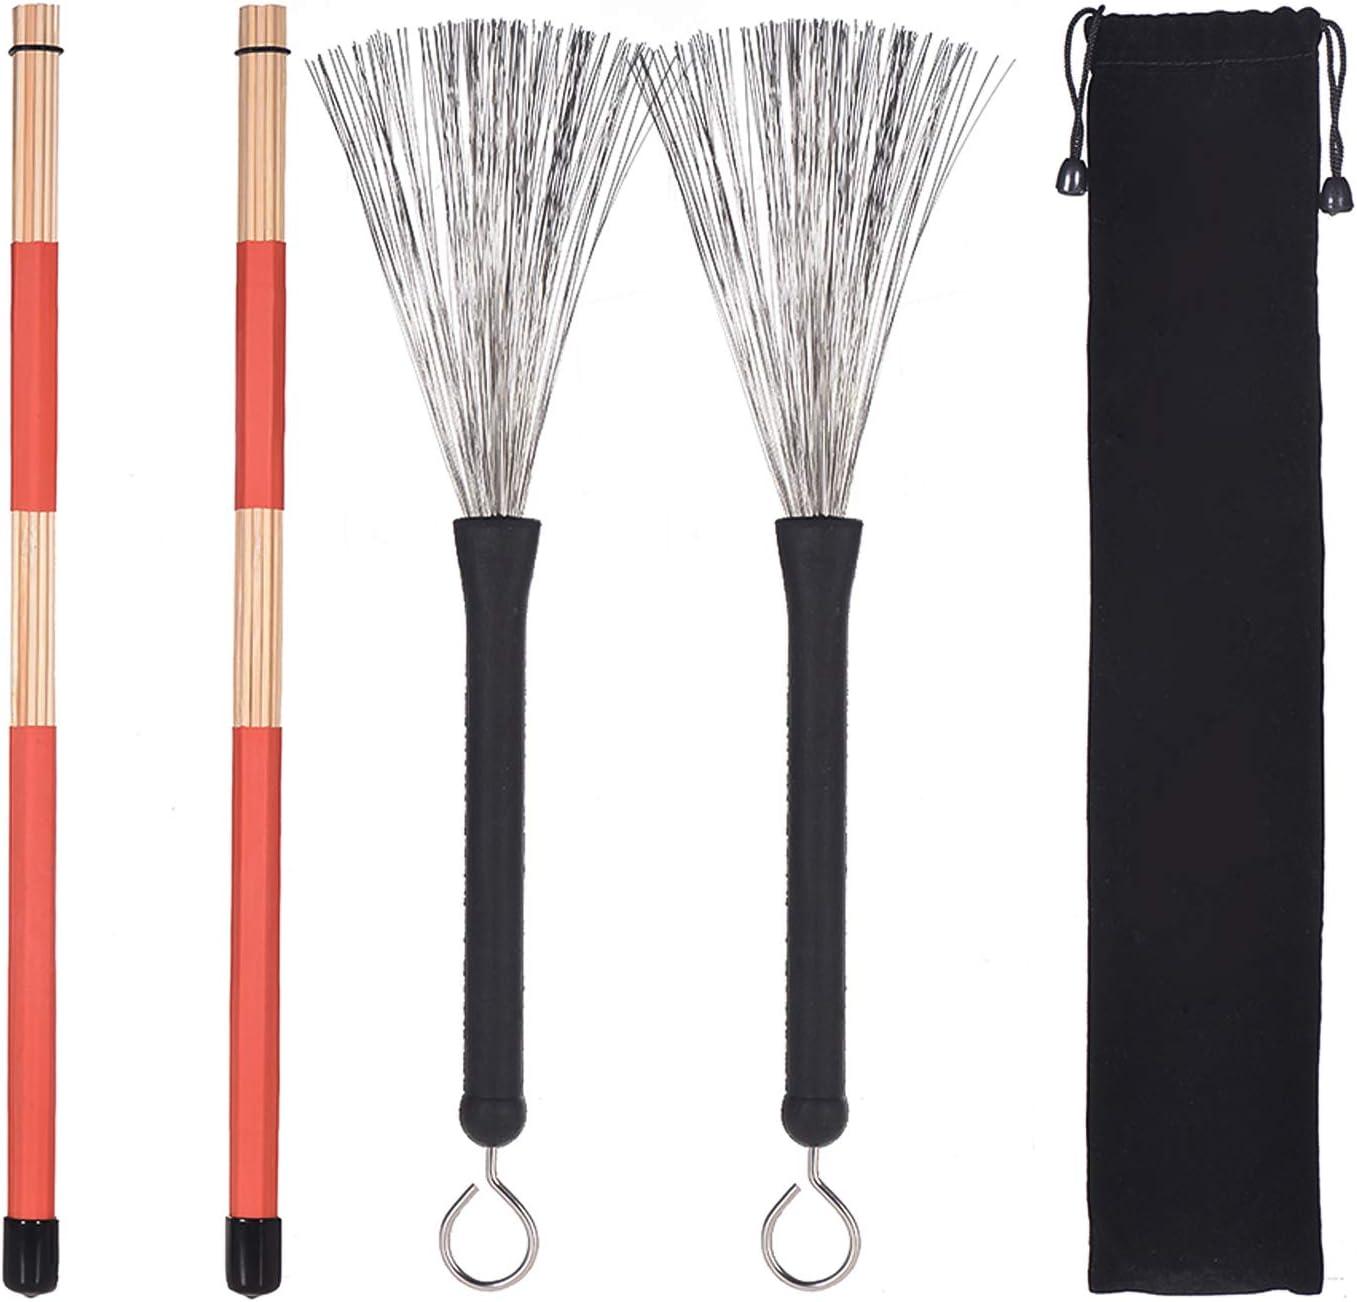 Popular brand 1 Max 88% OFF Pair Drum Rods Sticks wit Set Brushes Stick +